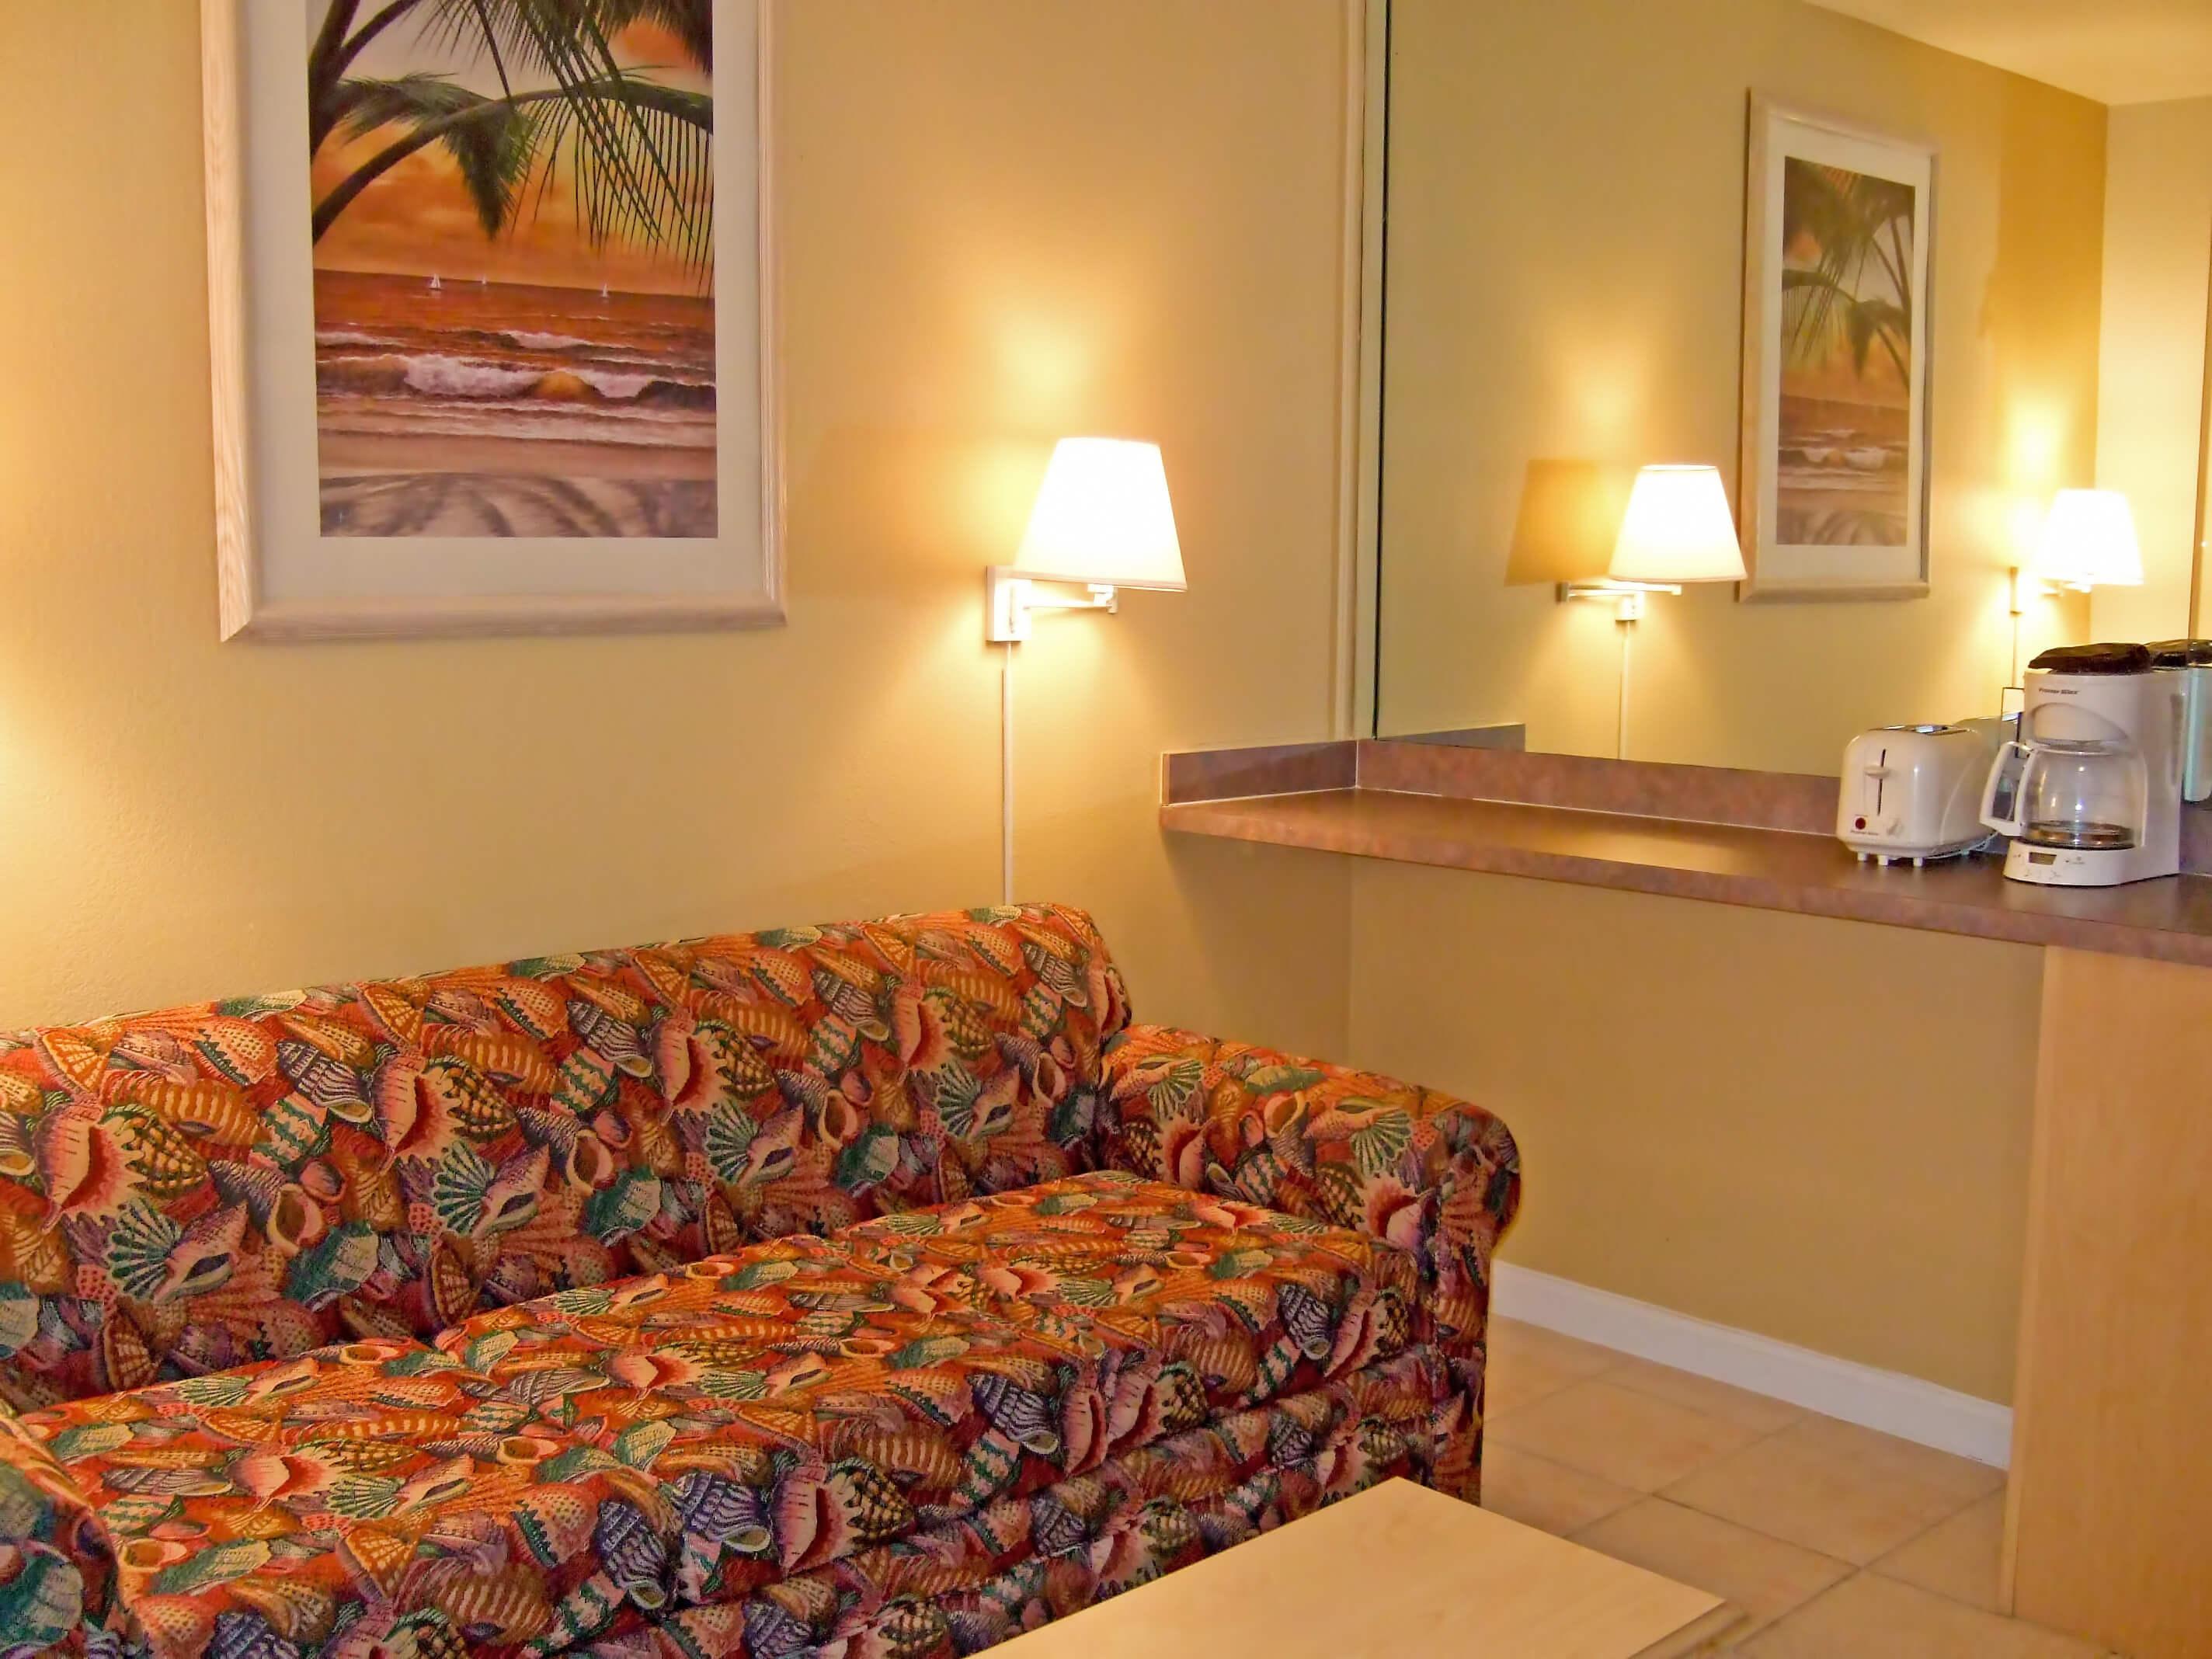 Daytona Beach Westgate Resorts | One-Bedroom Villa with Living Area and Queen Sleeper Sofa | Harbour Beach Resort